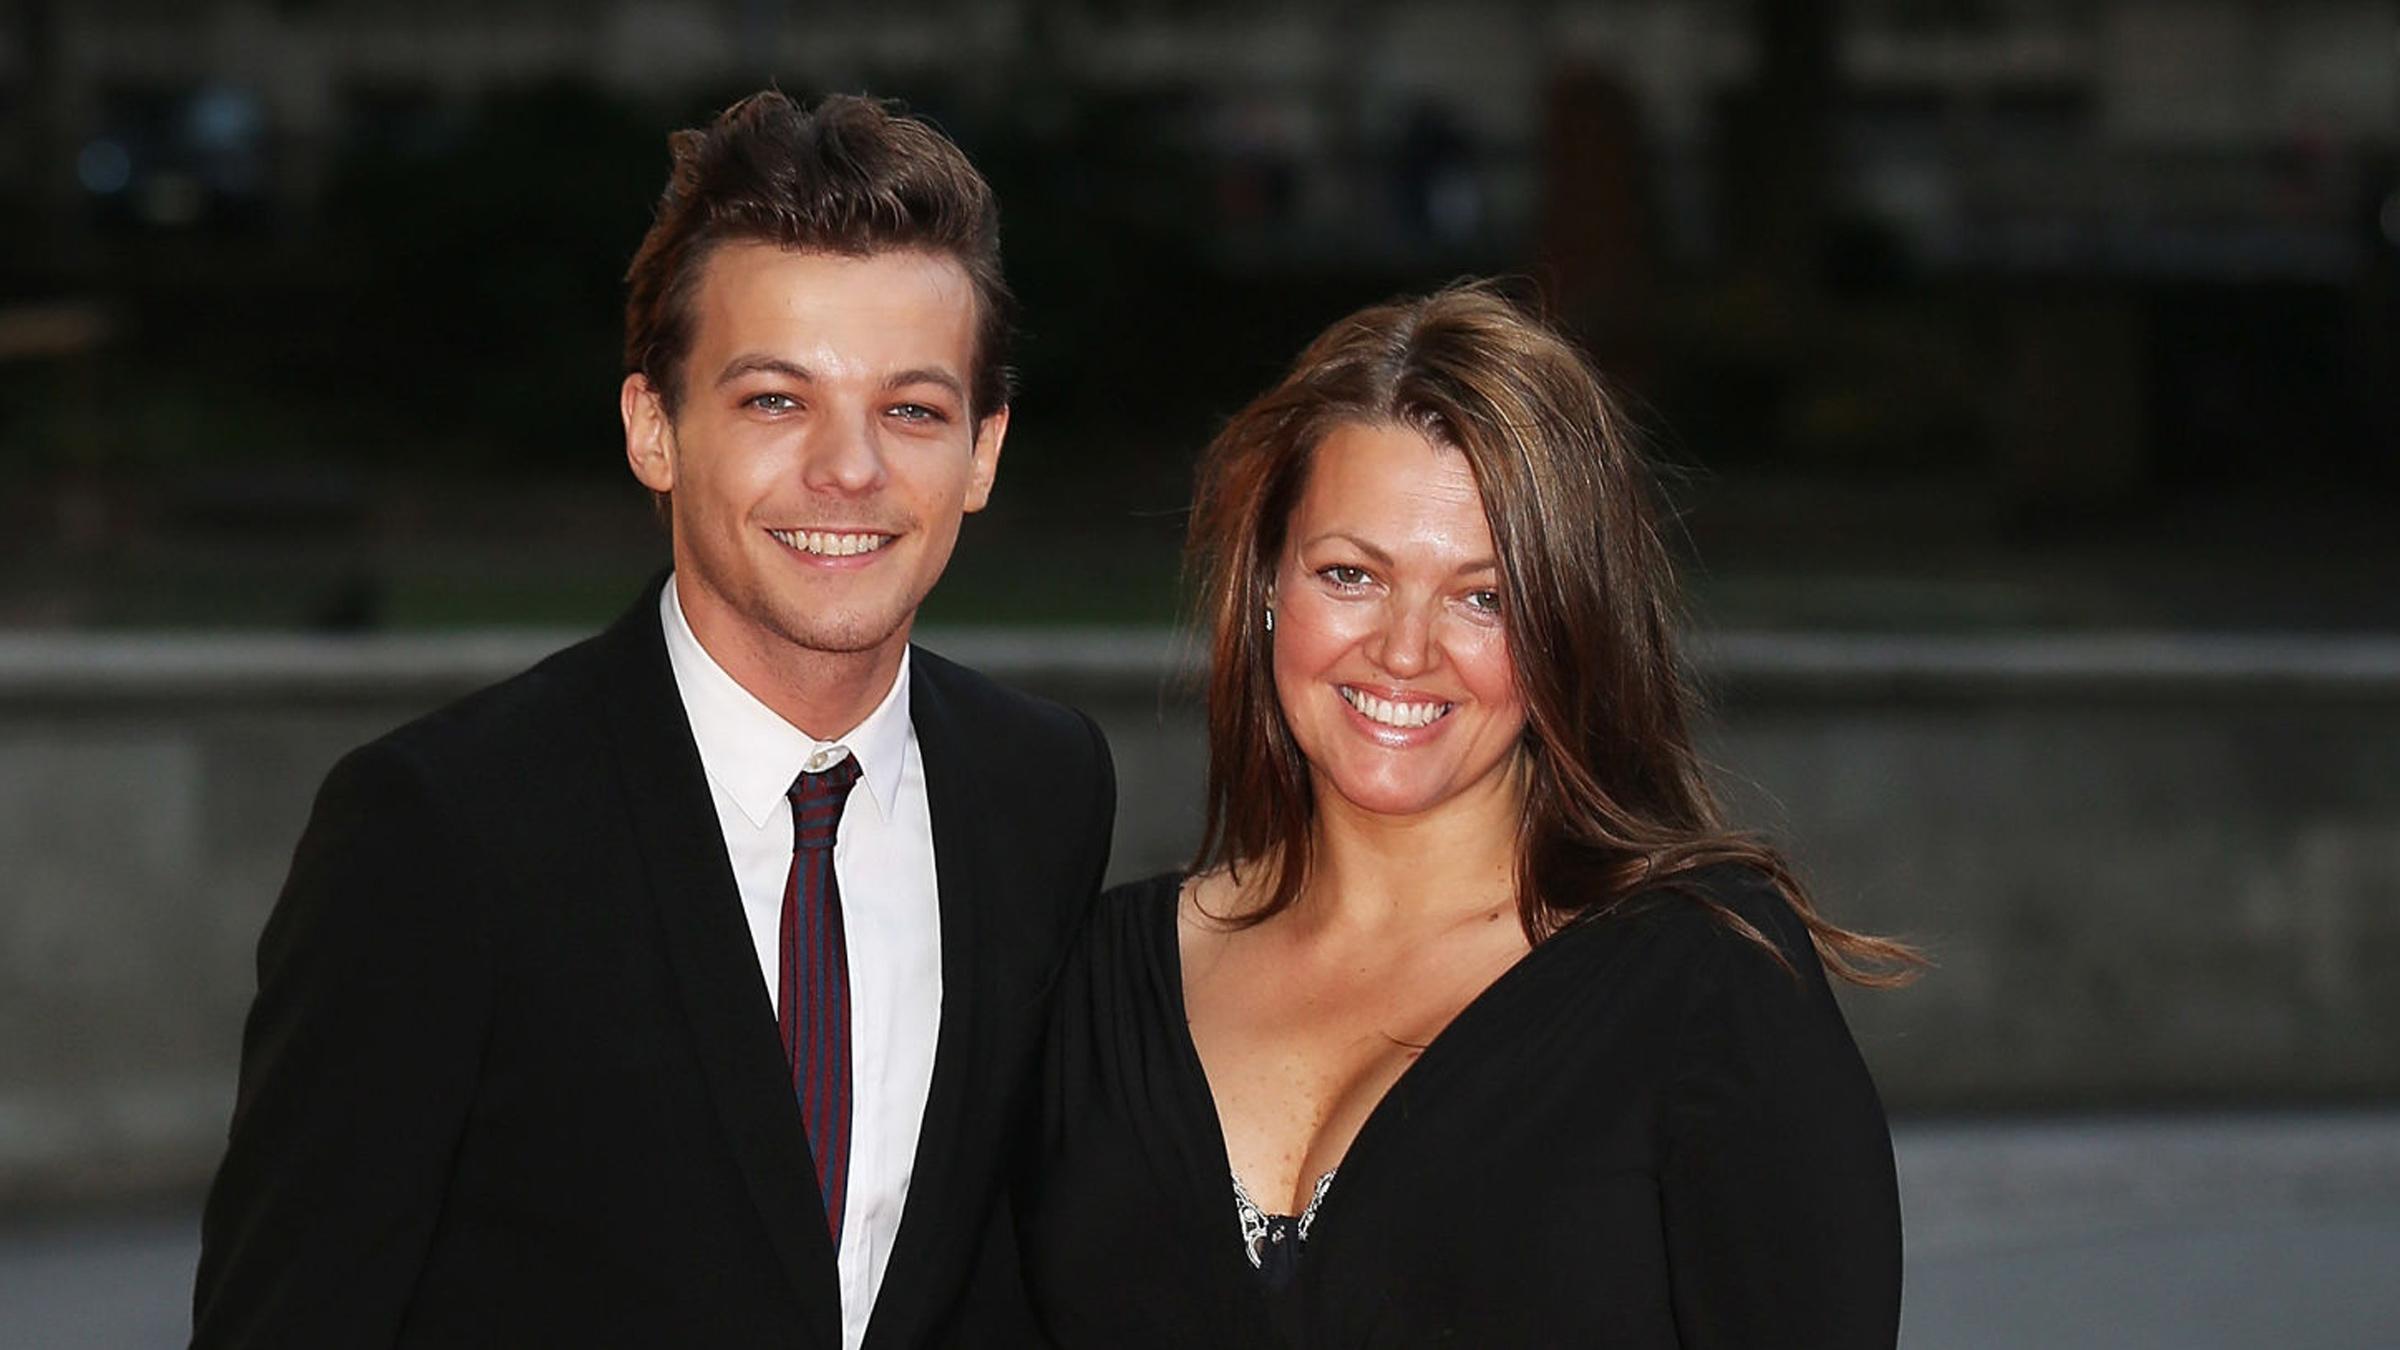 Louis moeder teaser